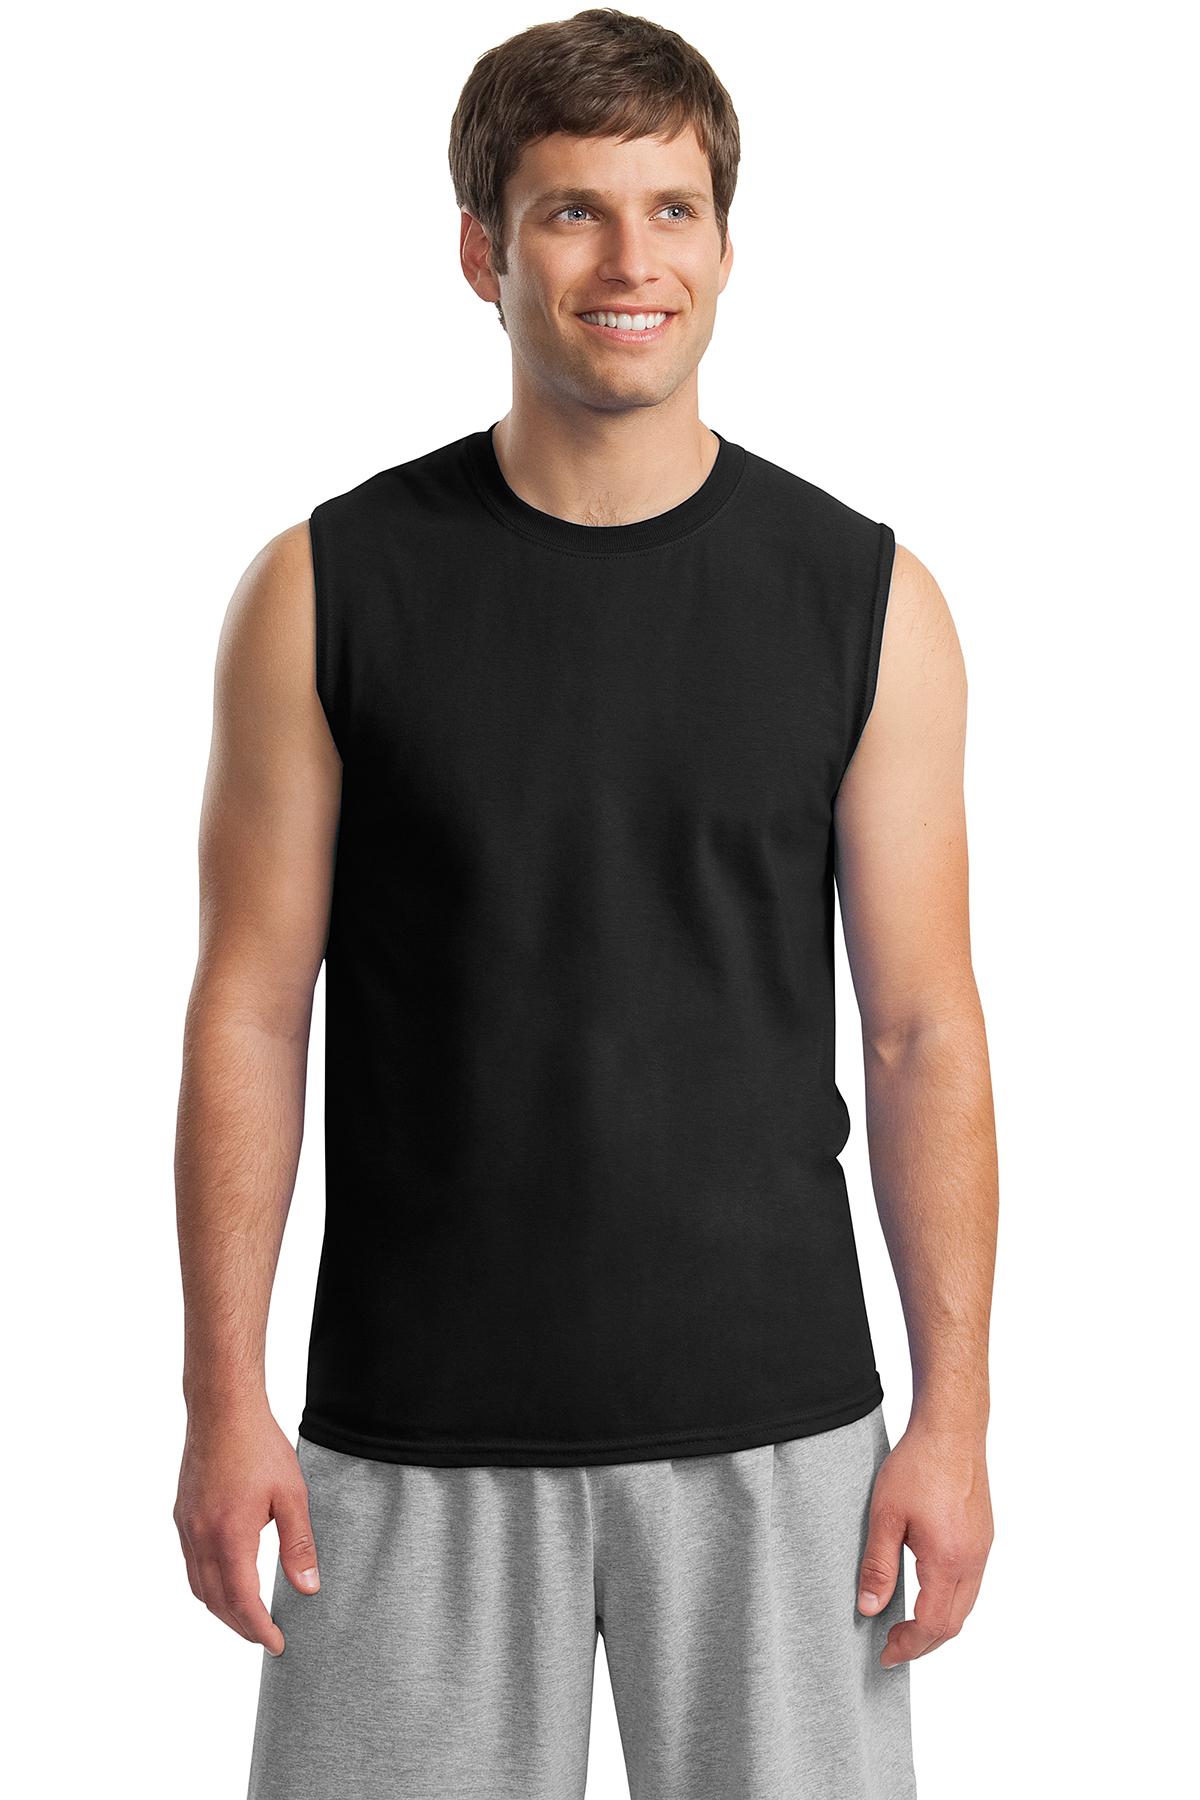 2f5b2a4b432c7 Gildan® - Ultra Cotton® Sleeveless T-Shirt